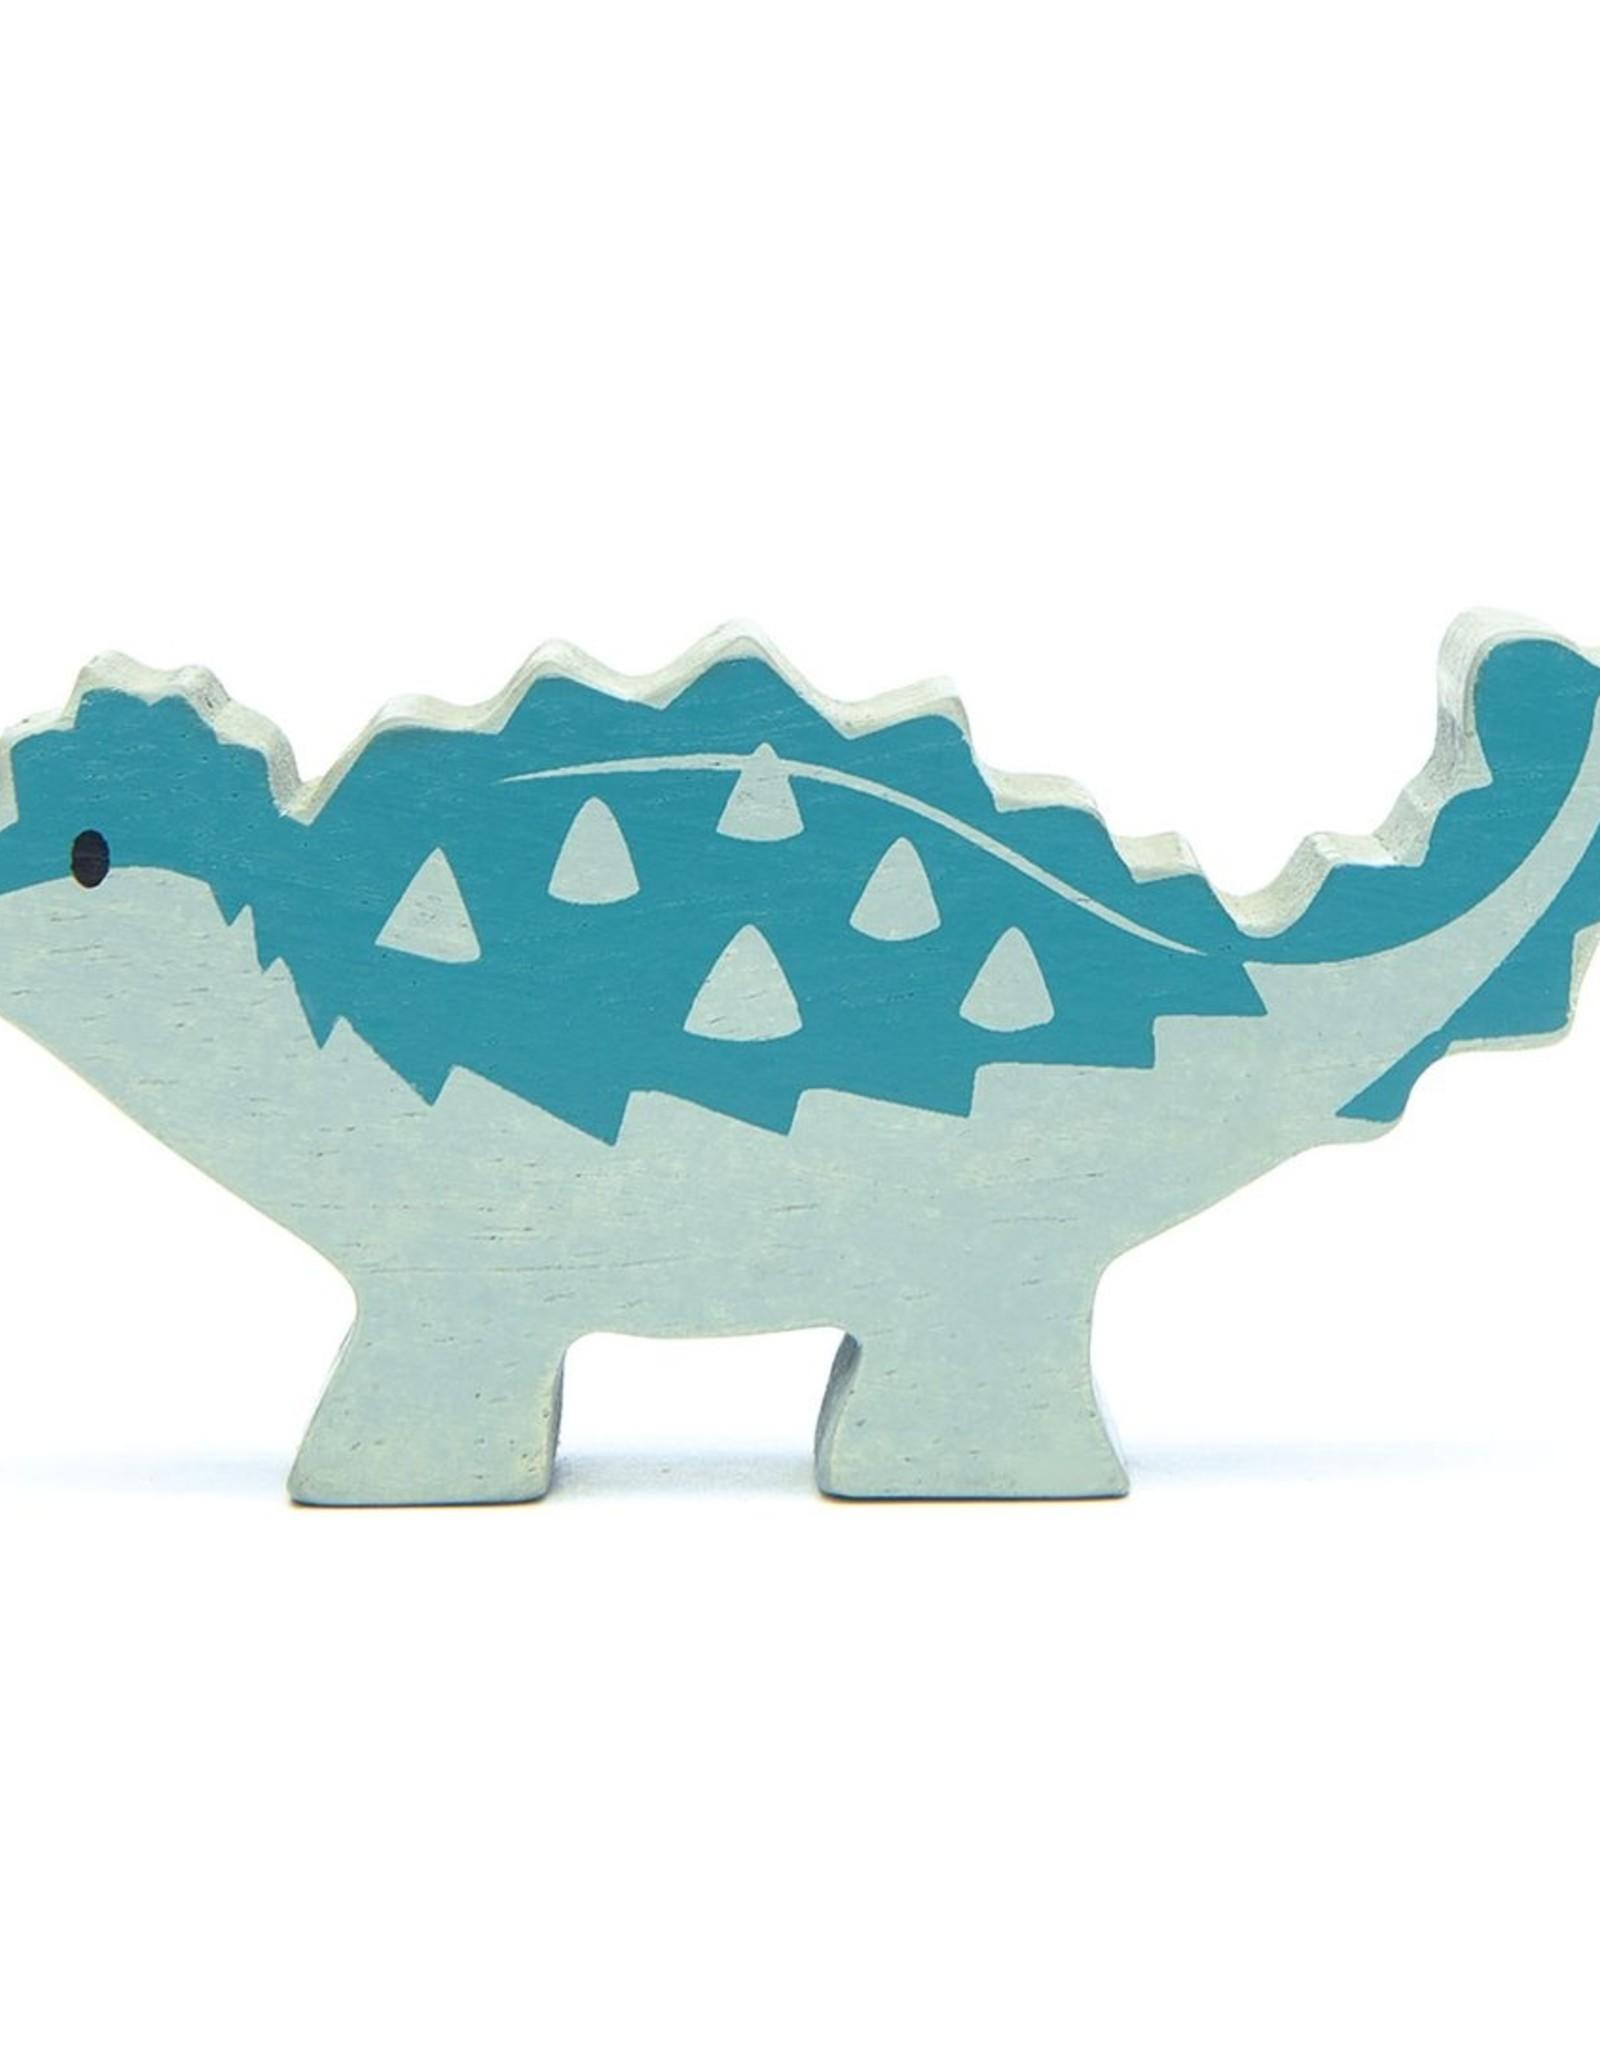 Tender leaf toys Ankylosaure